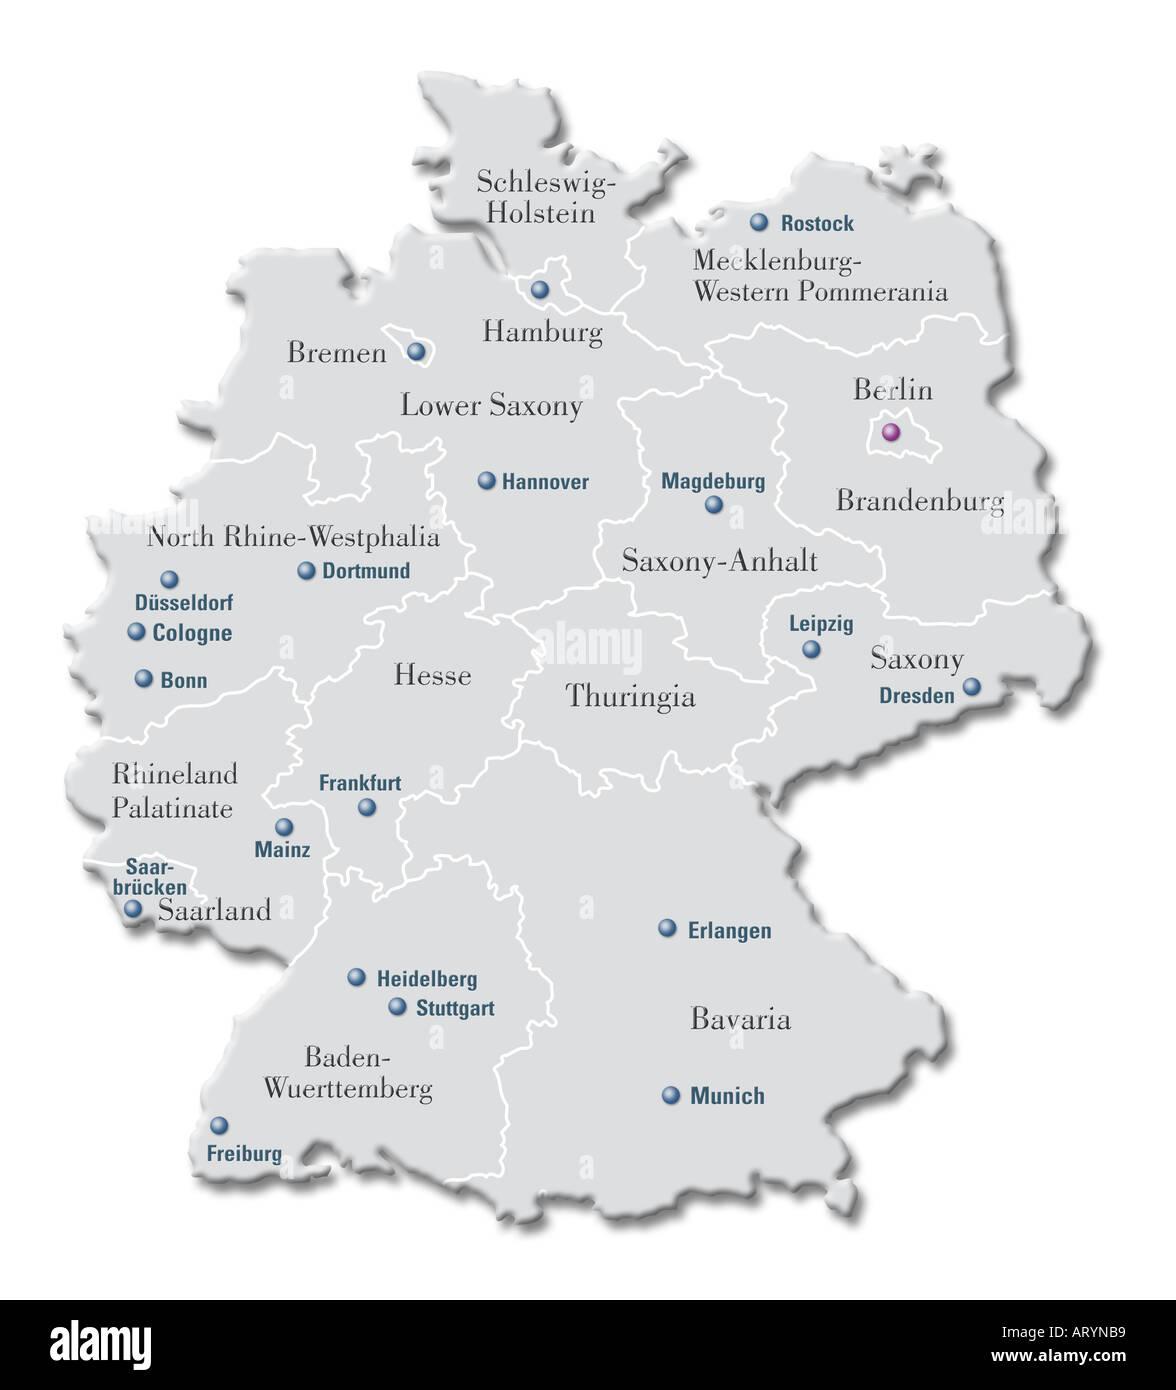 Carte Allemagne Noir Et Blanc.Map Germany Photos Map Germany Images Alamy